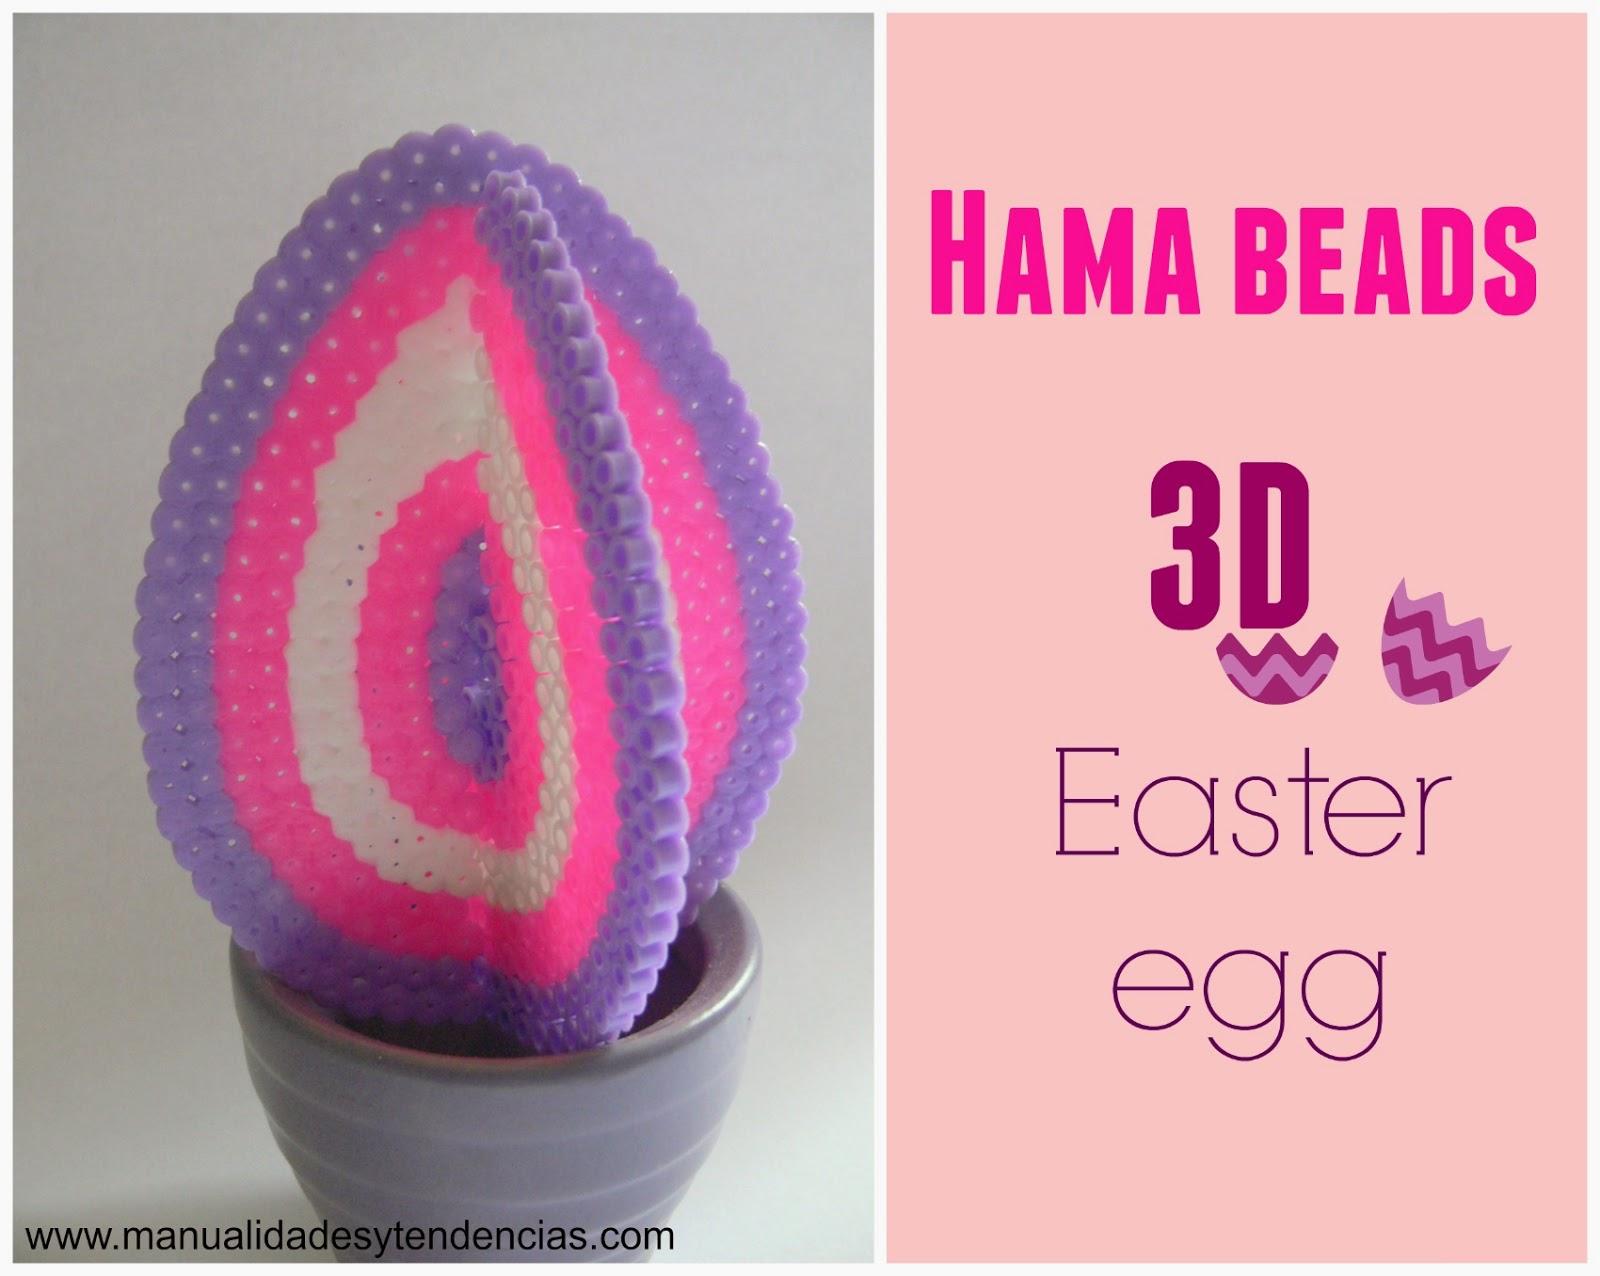 hama beads easter egg